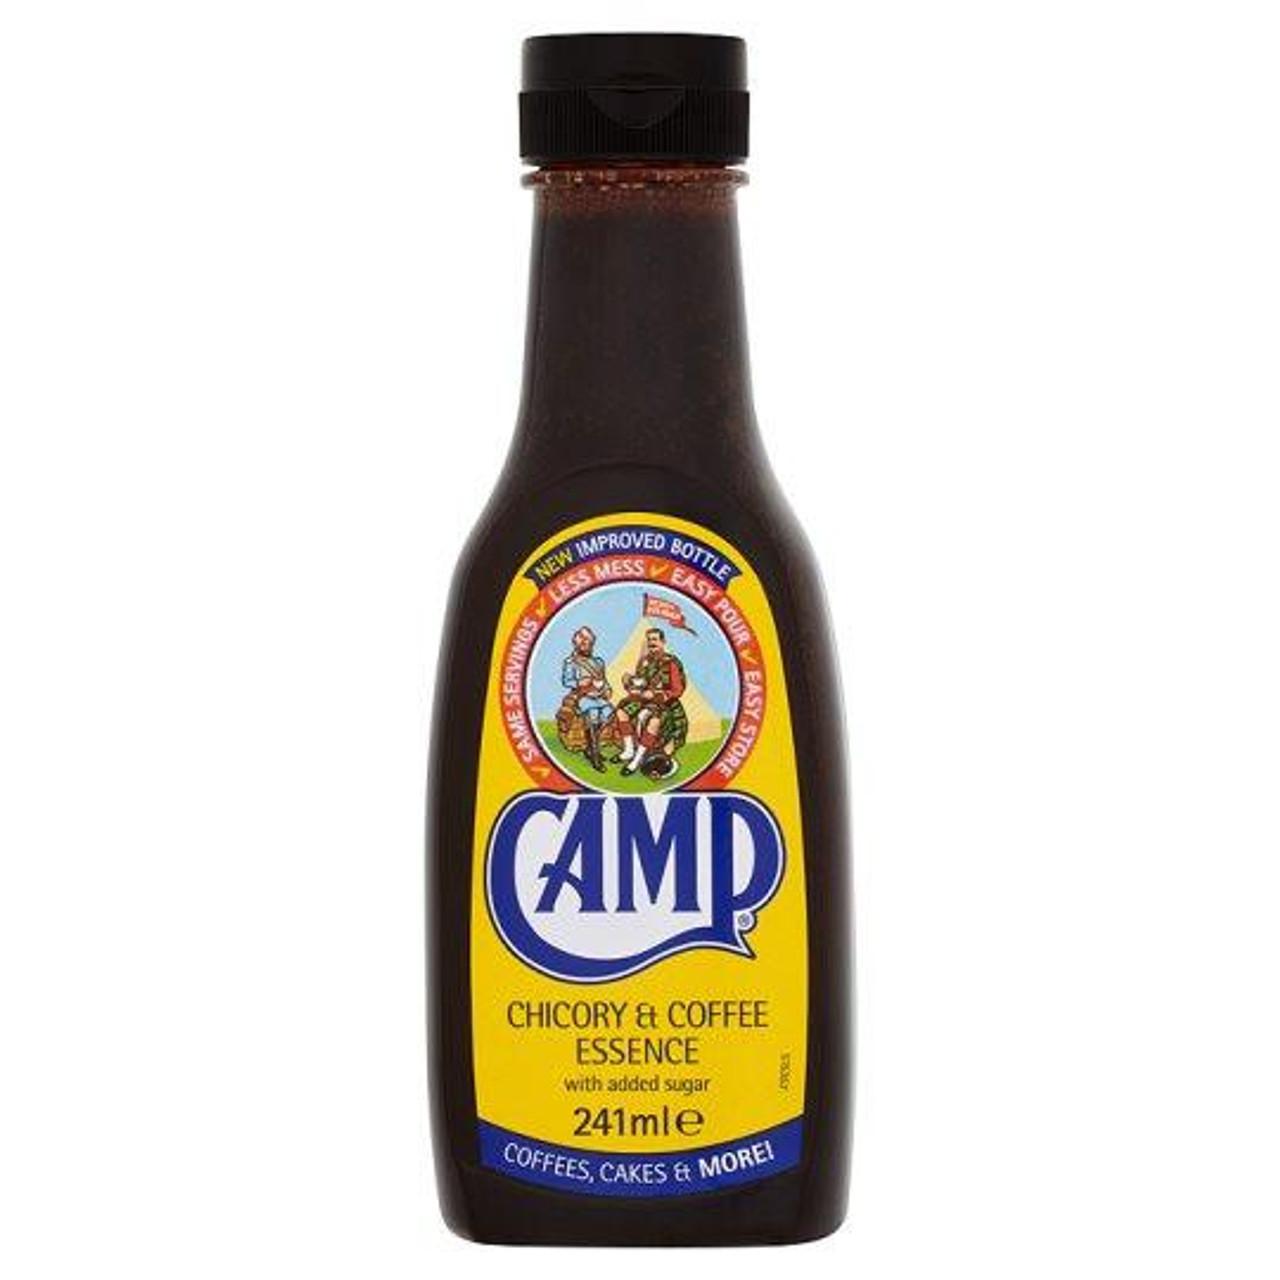 Camp - Chicory & Coffee Essence, 241ml